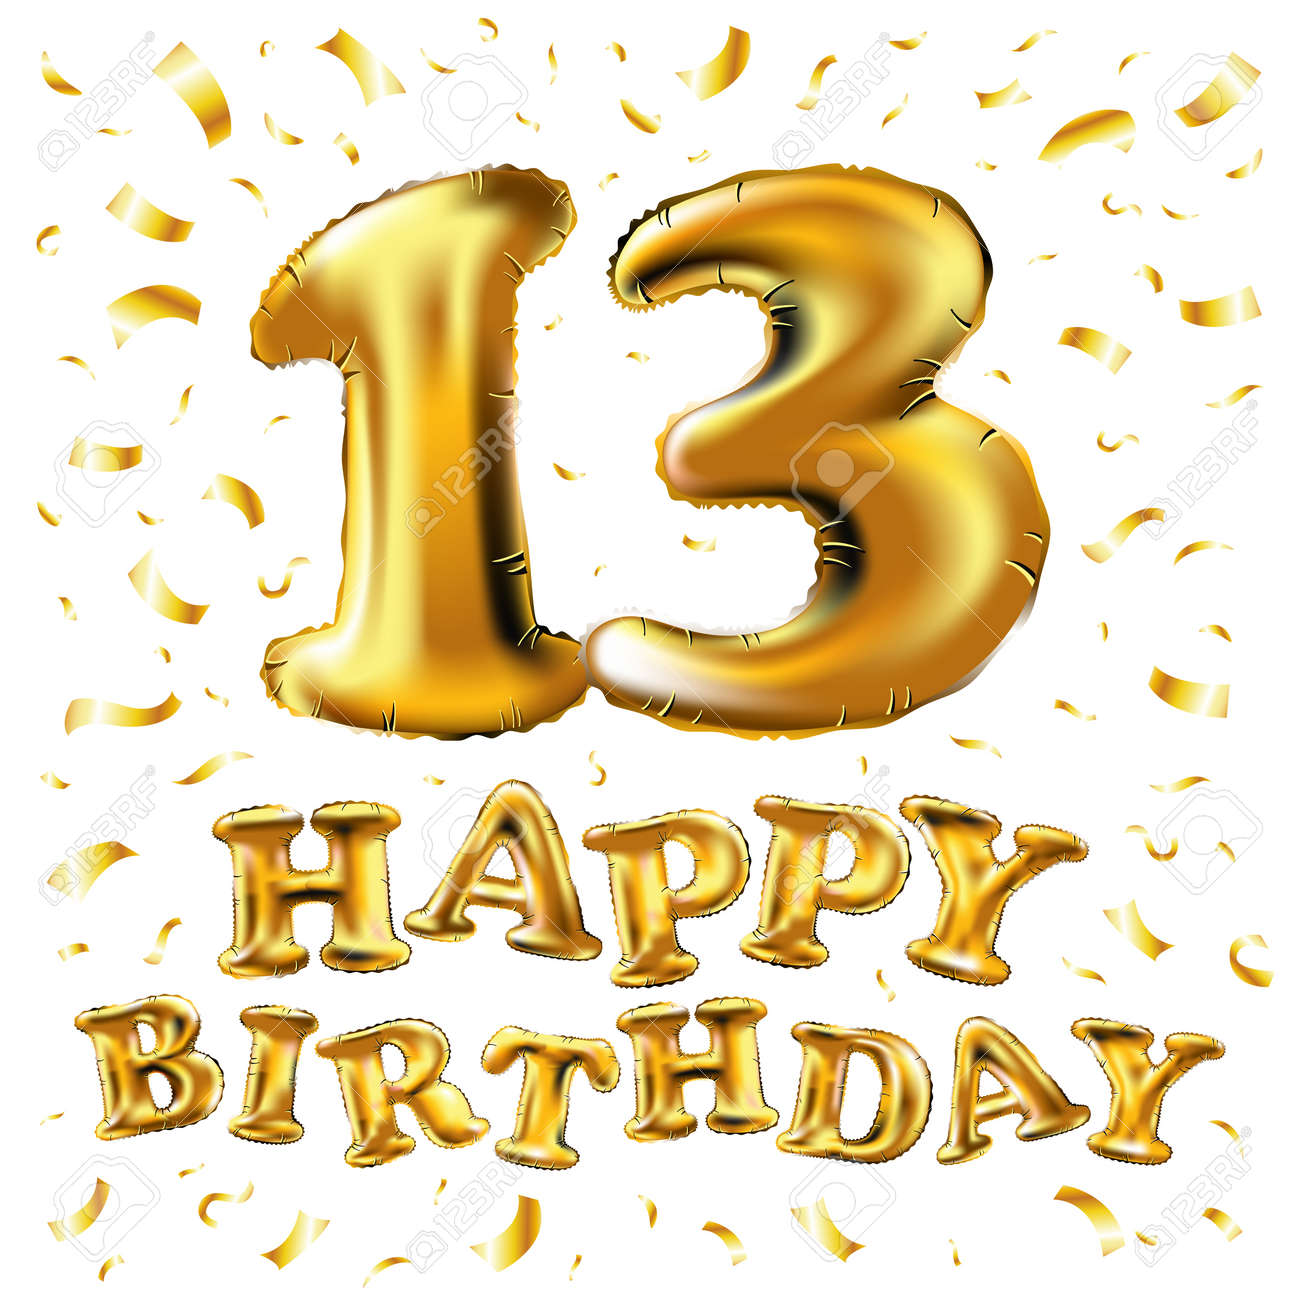 happy birthday 13th birthday design royalty free cliparts vectors